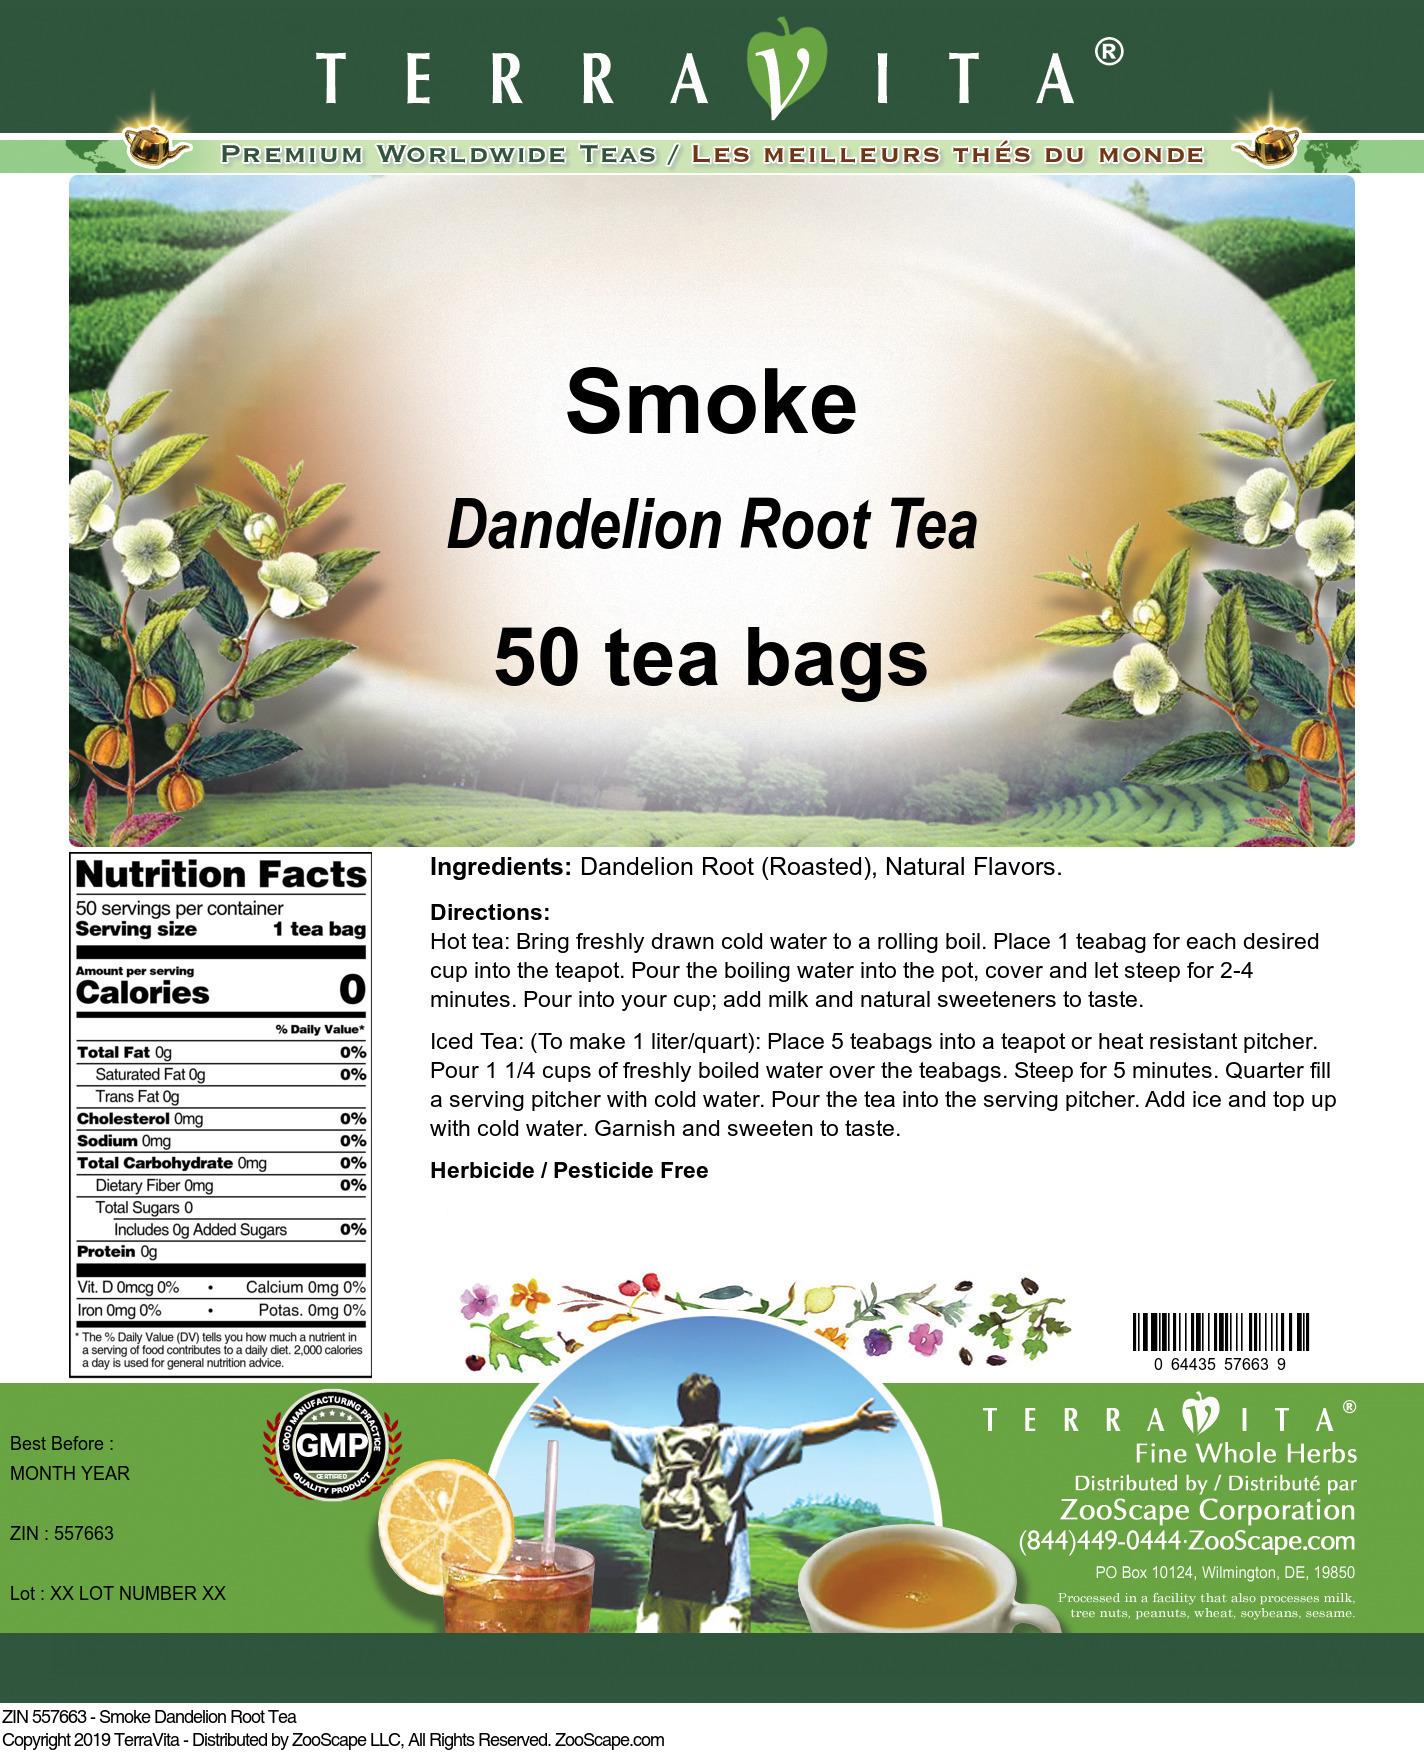 Smoke Dandelion Root